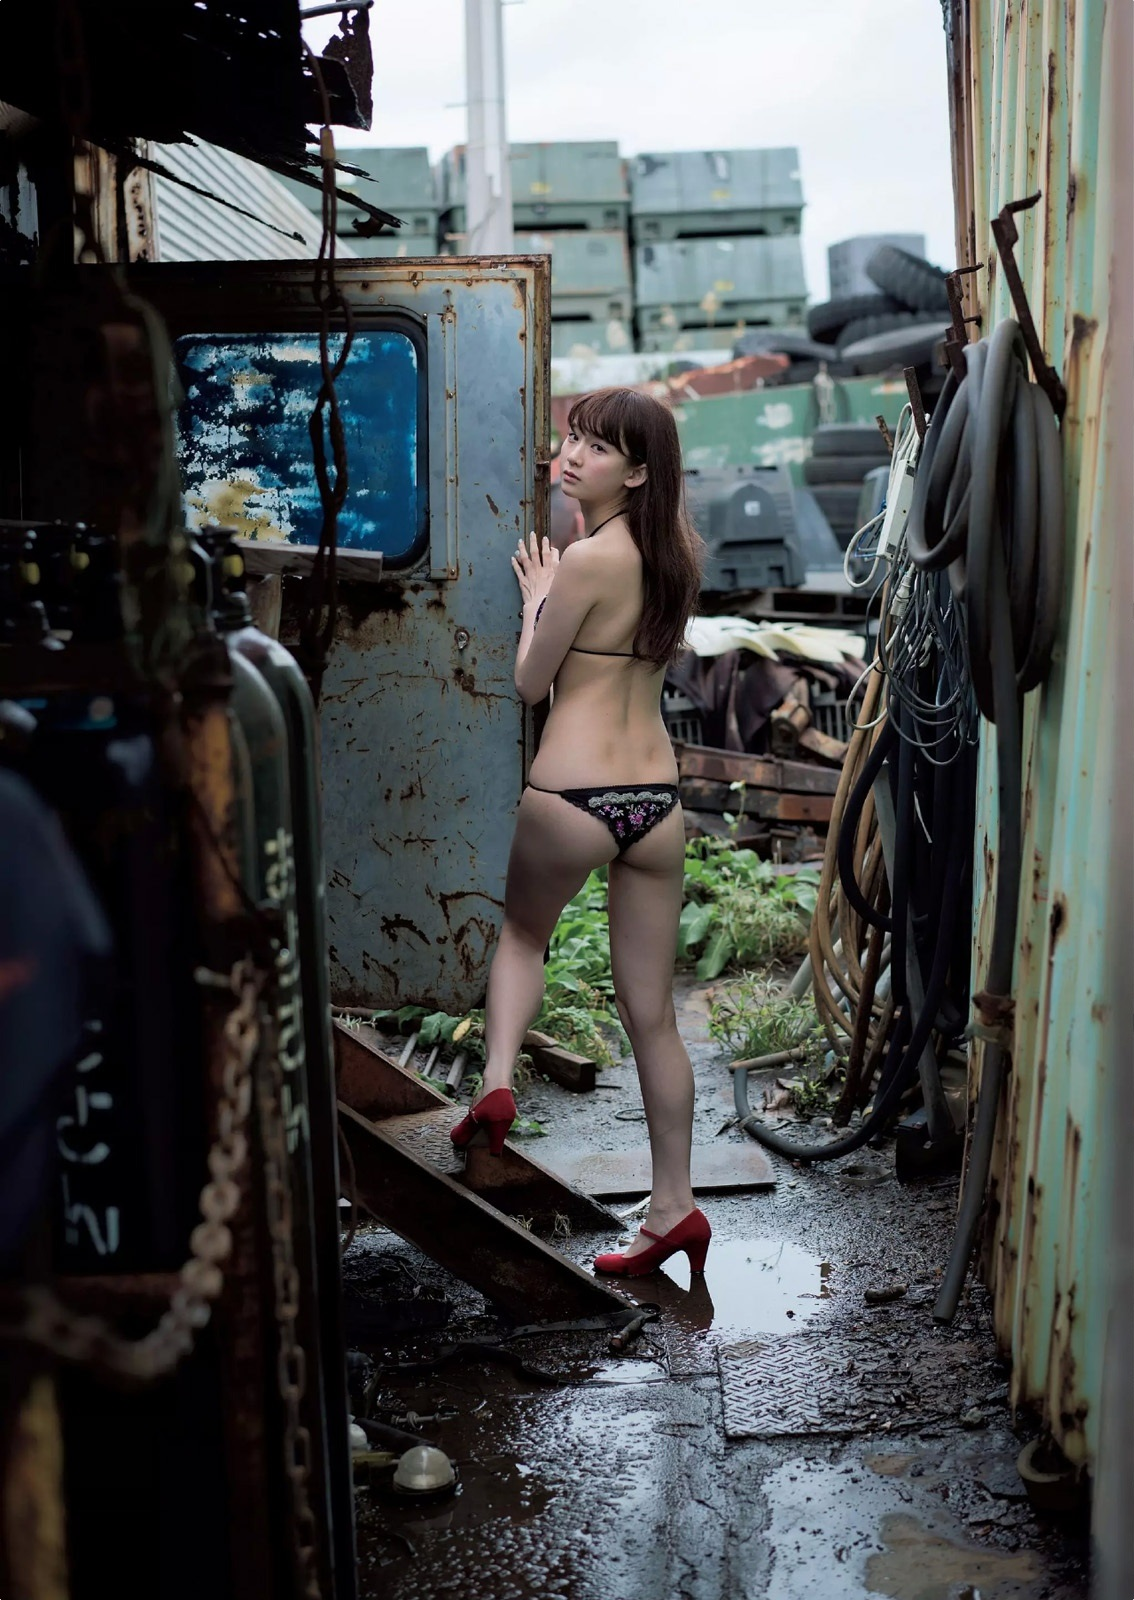 image http://scanlover.com/assets/images/272-vLGI8nYnkSGxYu5Y.jpeg